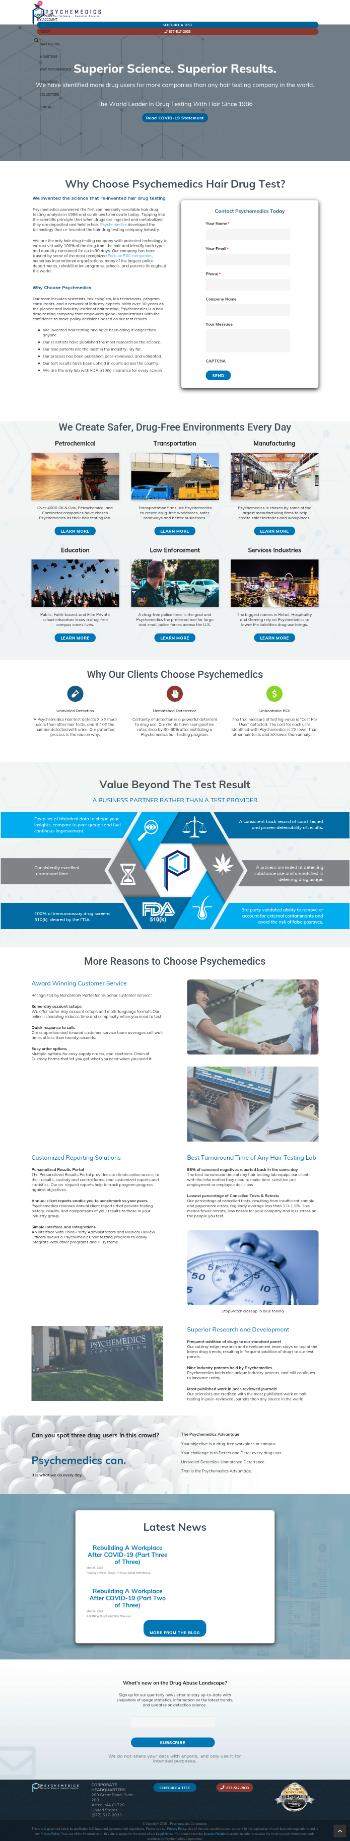 Psychemedics Corporation Website Screenshot